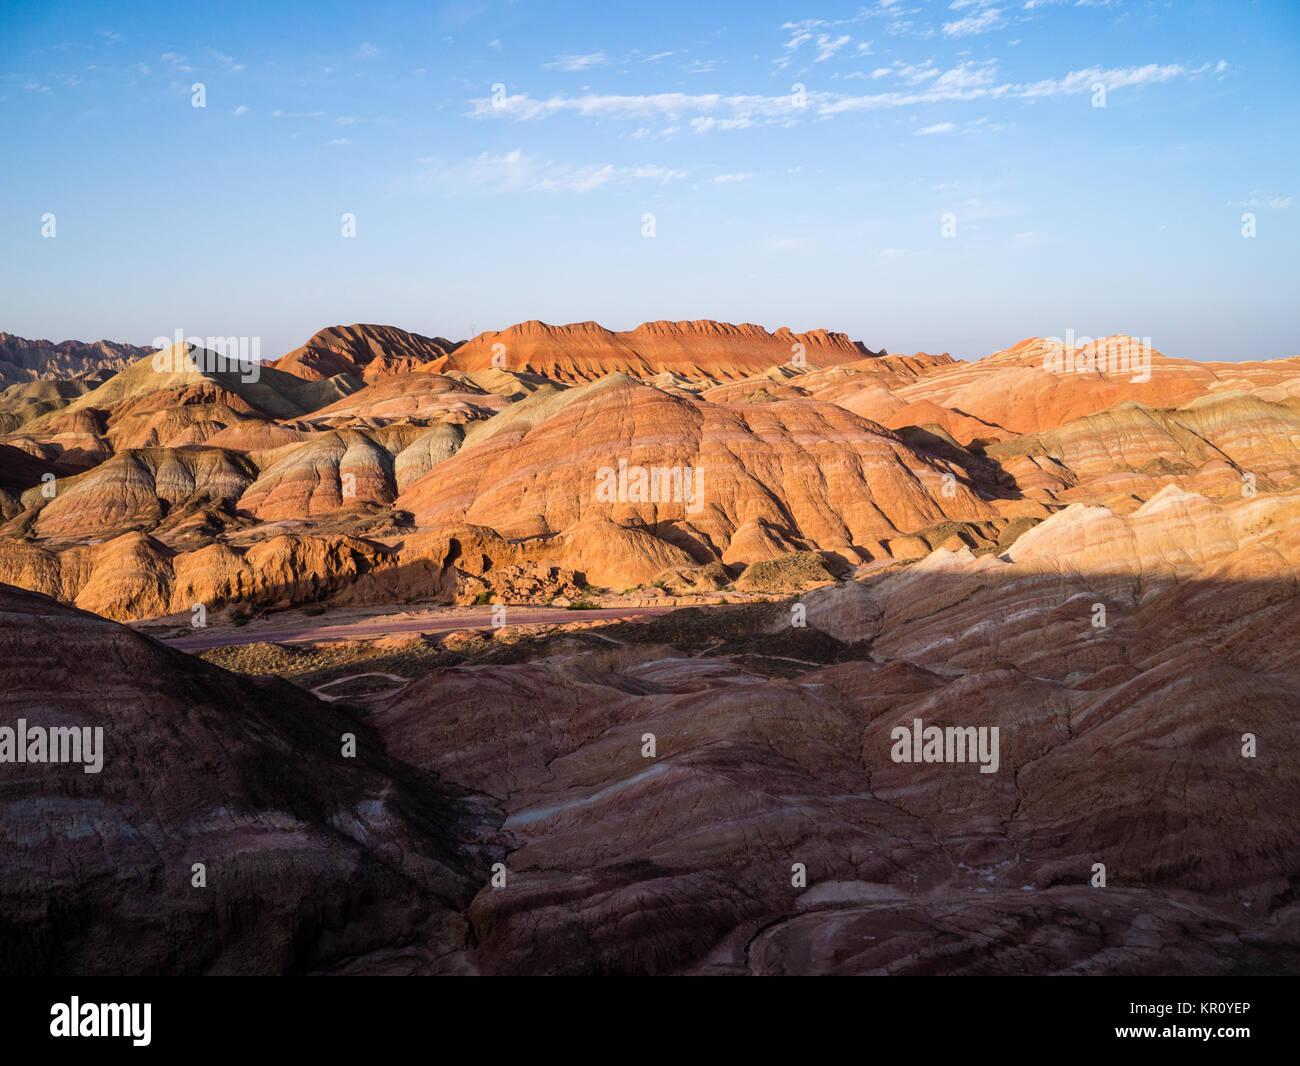 Danxia Landform in Zhangye, Gansu Province, China - Stock Image